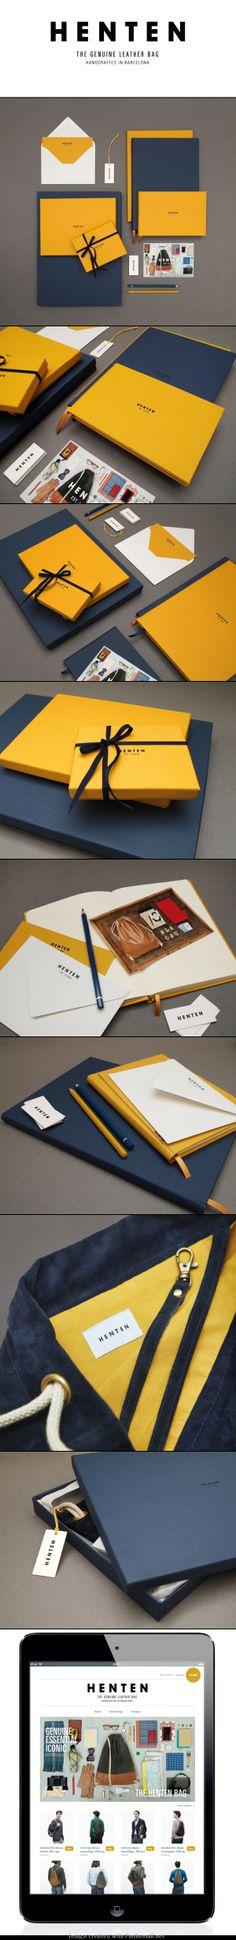 http://www.behance.net/gallery/HENTEN-Corporate-Identity-Packaging/6238309 - created via http://pinthemall.net